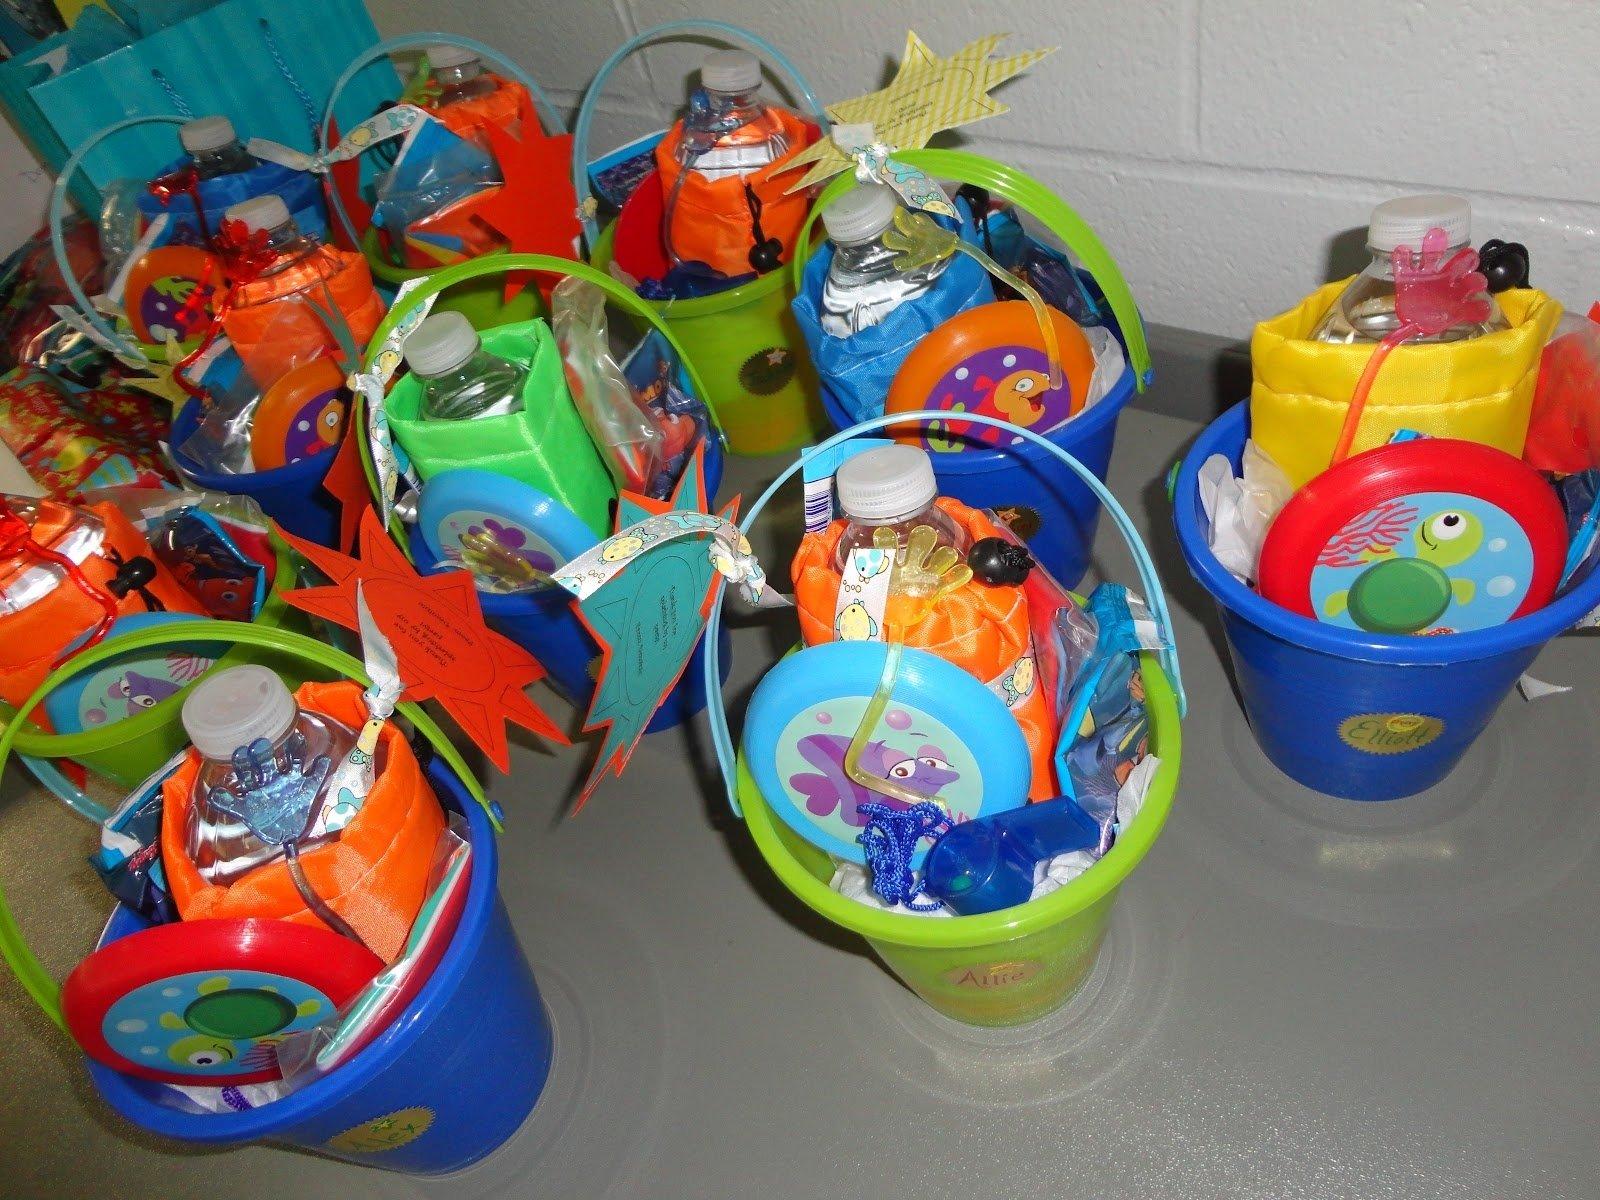 10 Stylish Finding Nemo Birthday Party Ideas finding nemo birthday party supplies partyelf childrens theme 2020